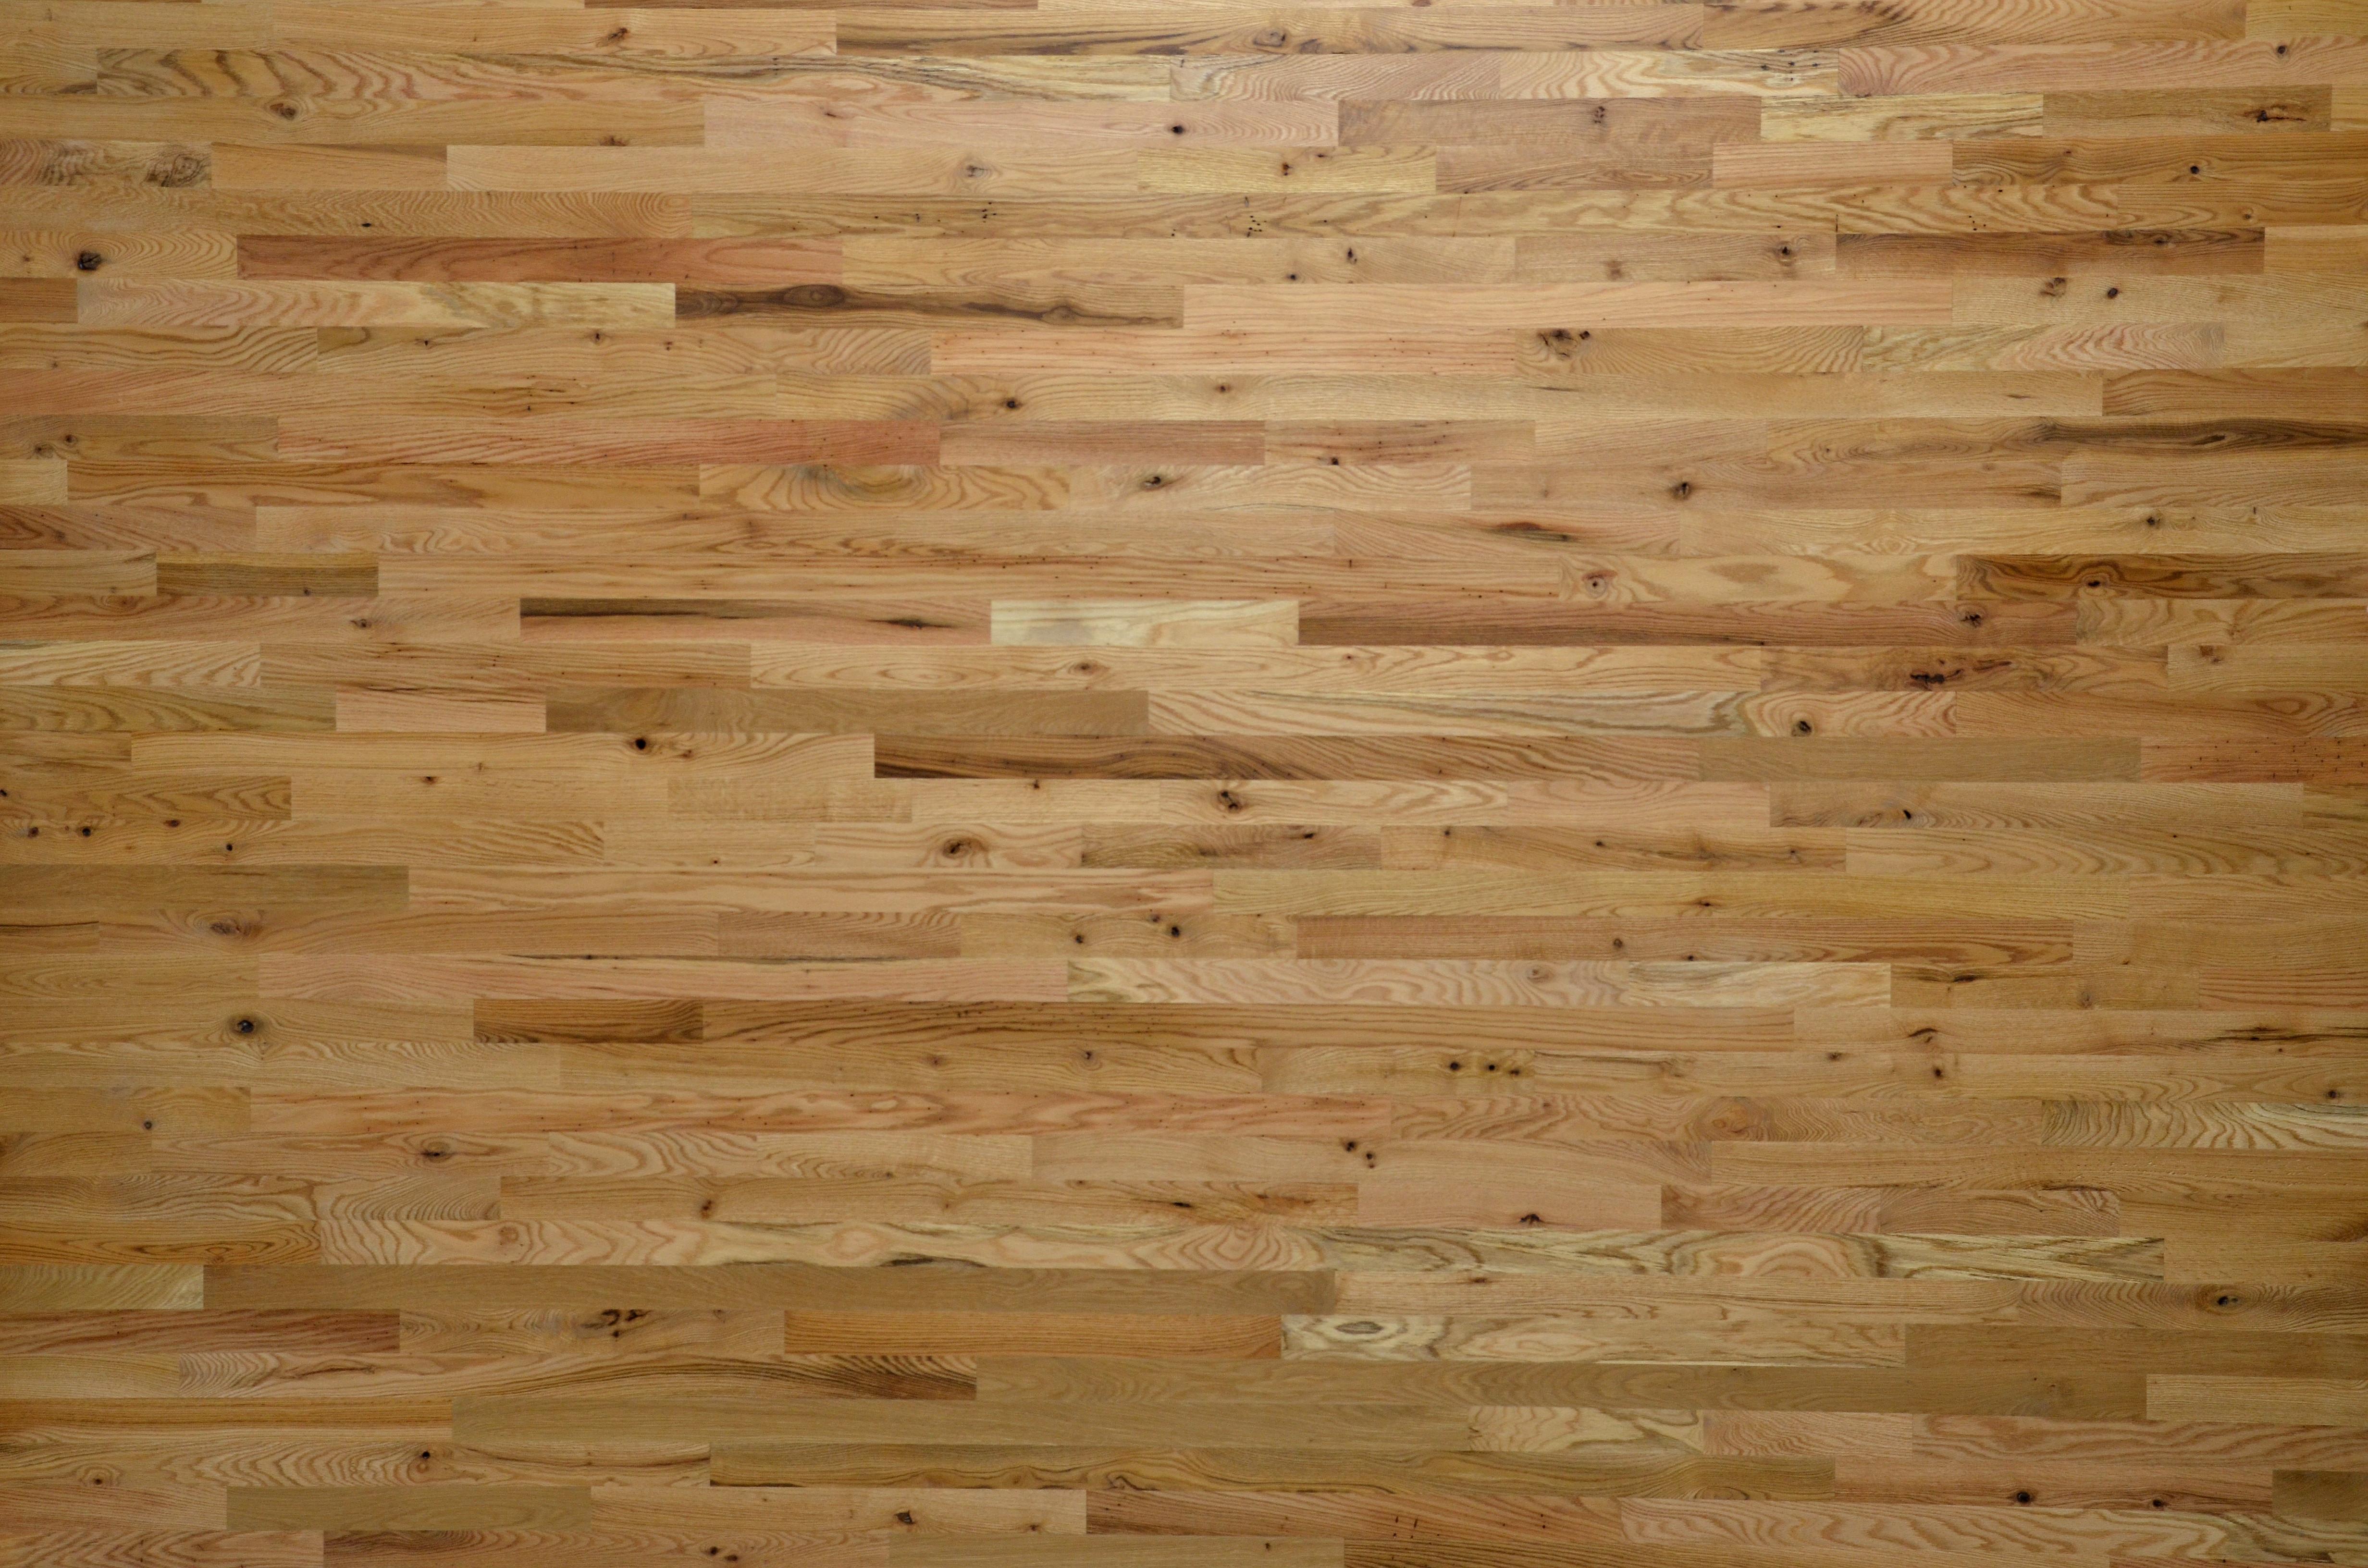 american oak hardwood flooring of lacrosse hardwood flooring walnut white oak red oak hickory intended for 2 common red oak